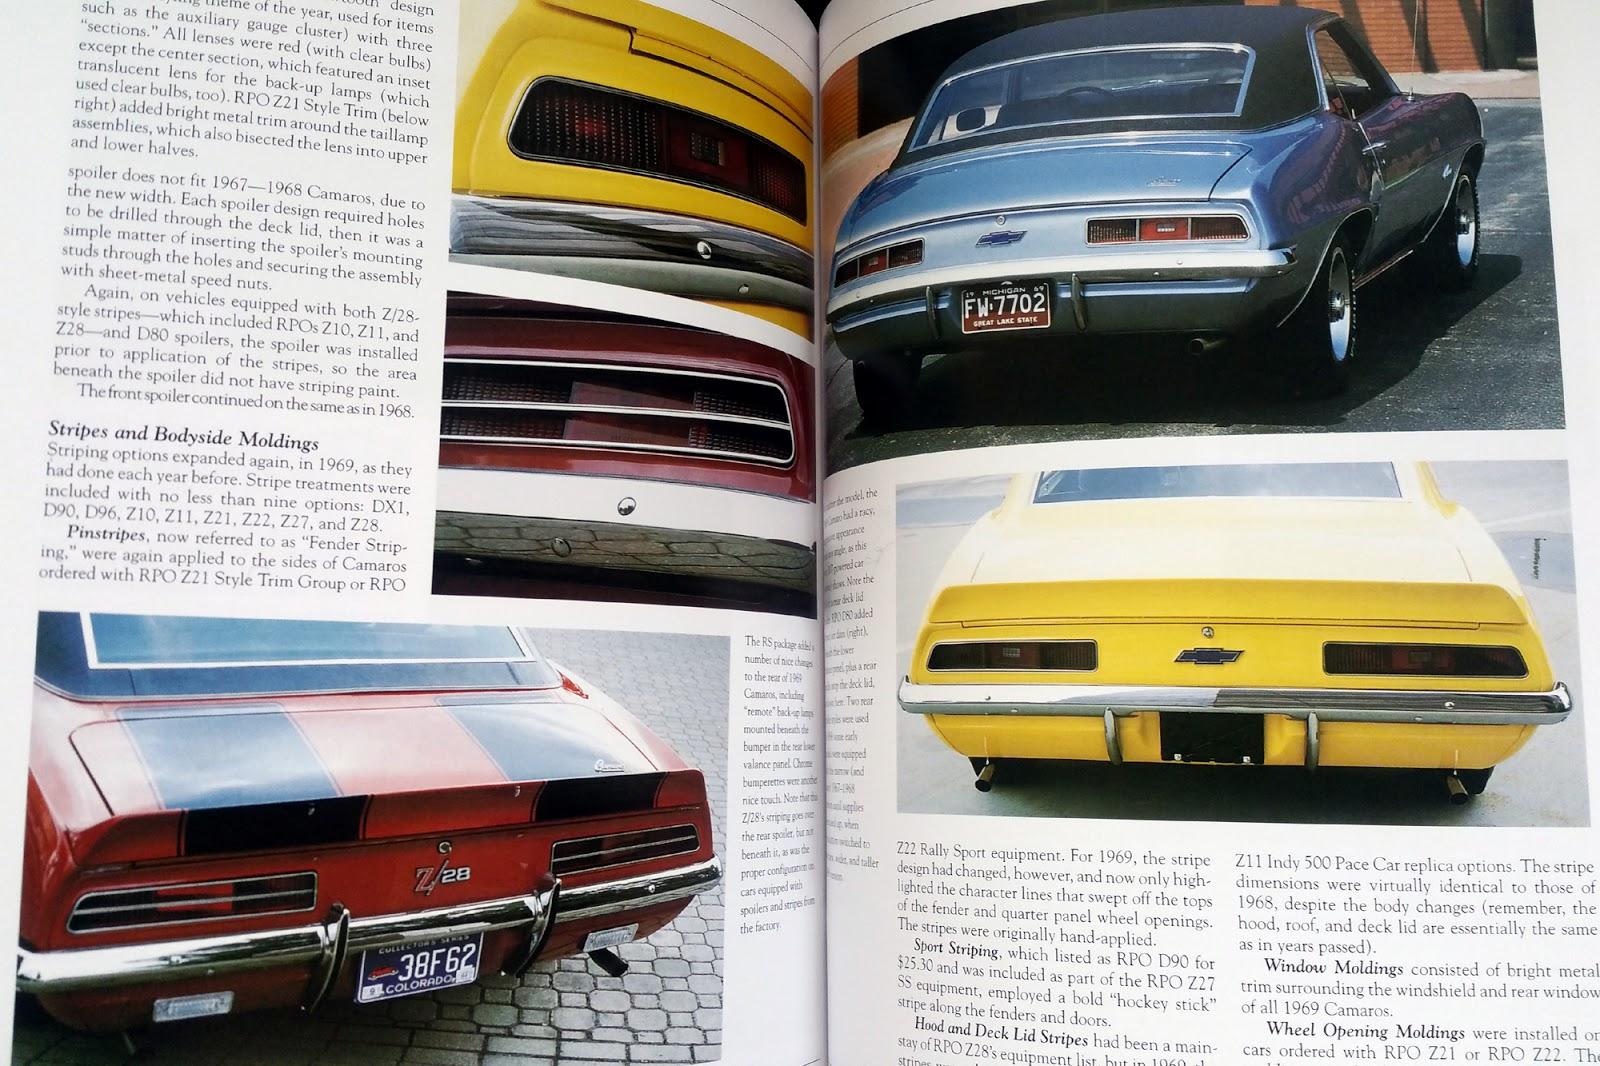 1971 Buick Riviera Silver Arrow On Toyota Engine Swap Wiring Harness